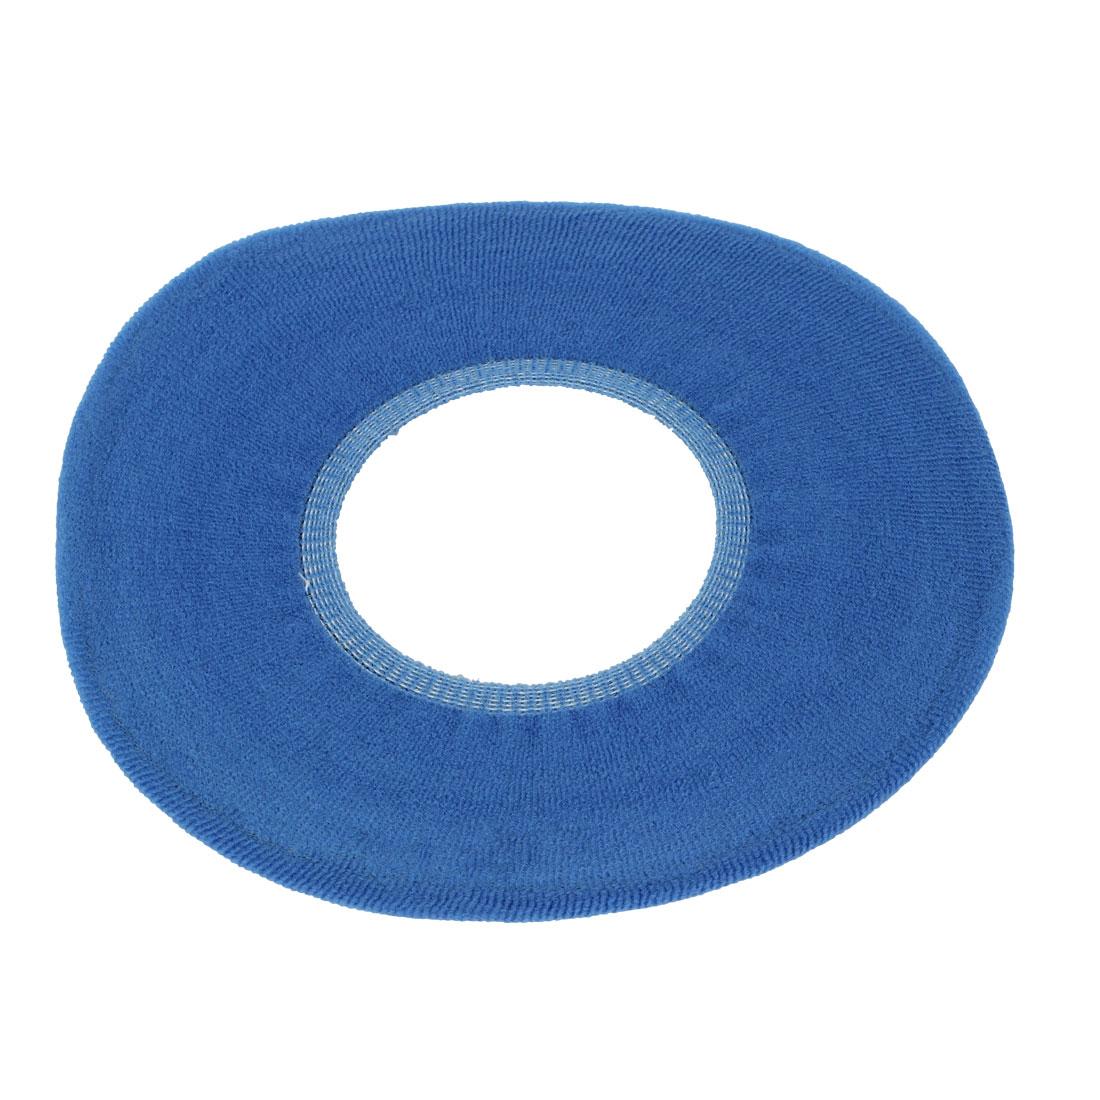 Elastic O Shape Warmer Pad Mat Deep Blue for Toilet Closestool Seat